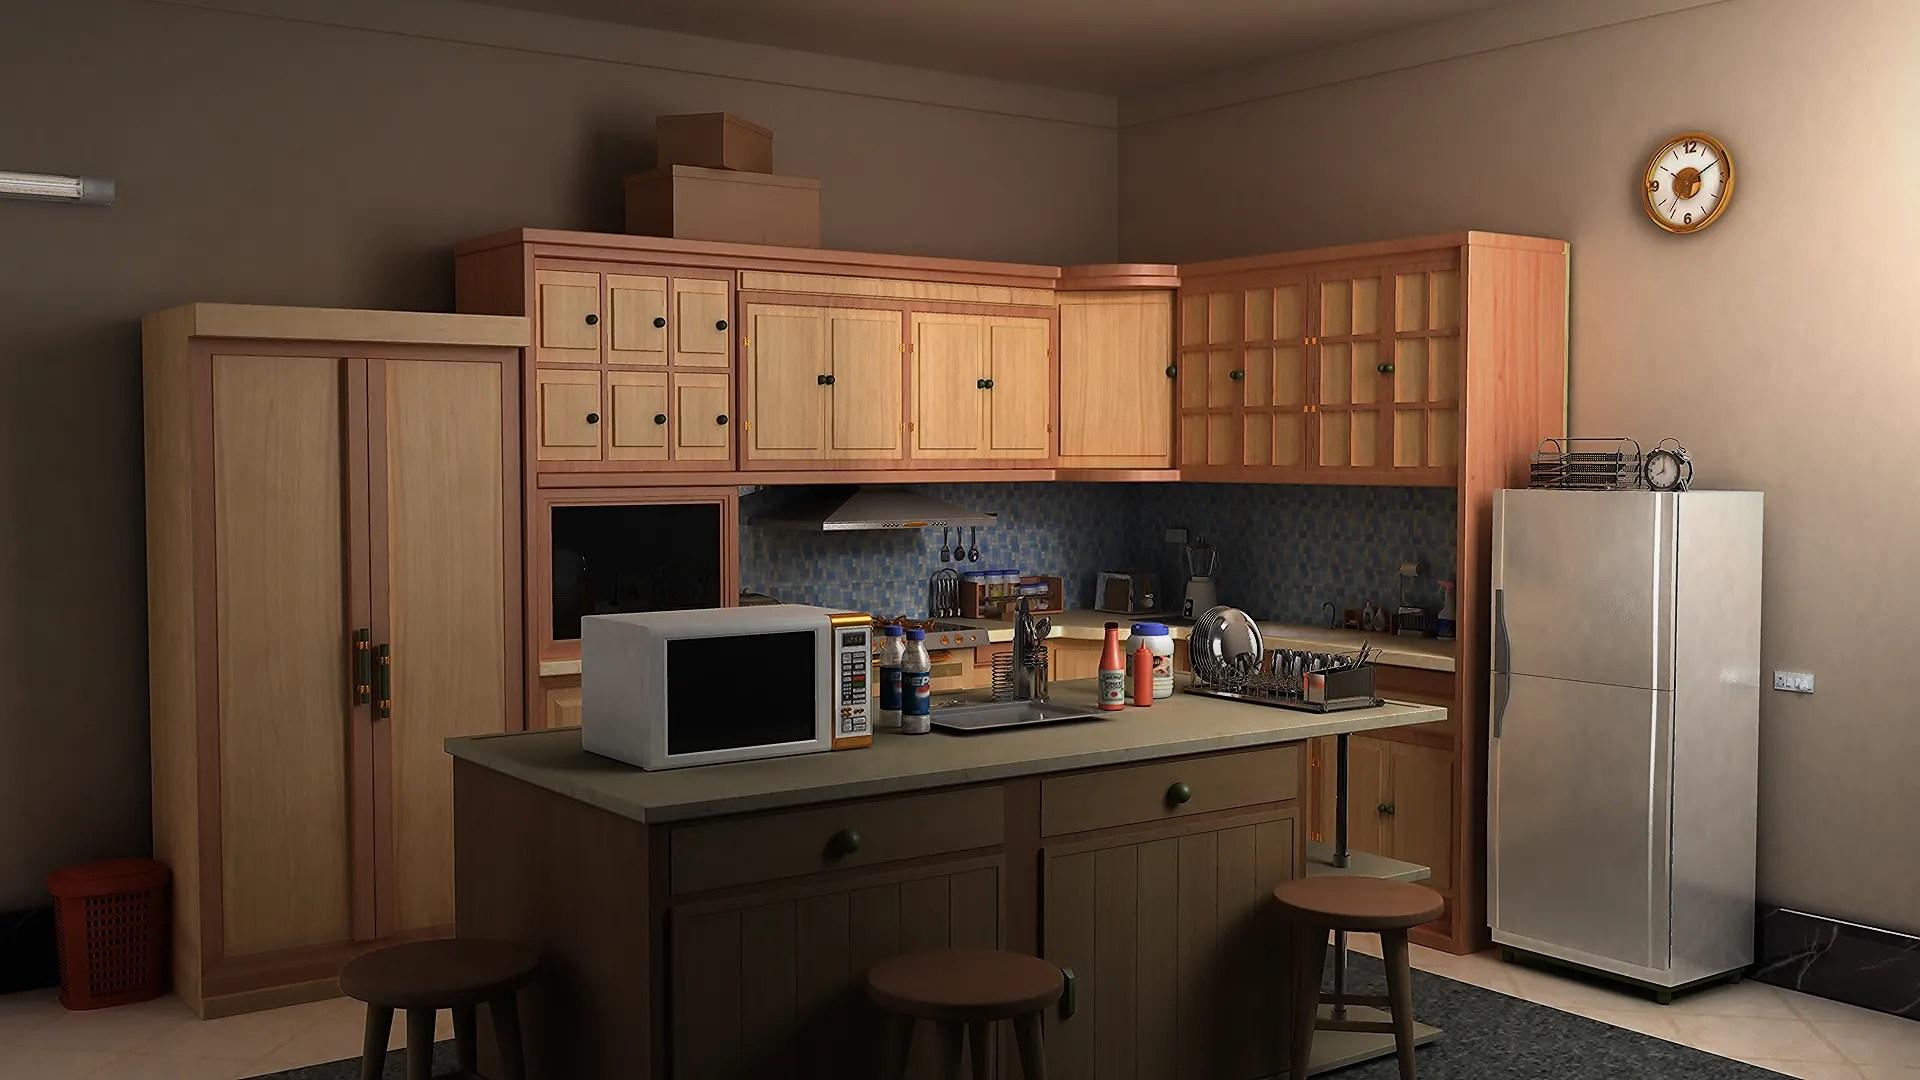 cozy kitchen 3D Model - FlatPyramid on Model Kitchen Images  id=14507